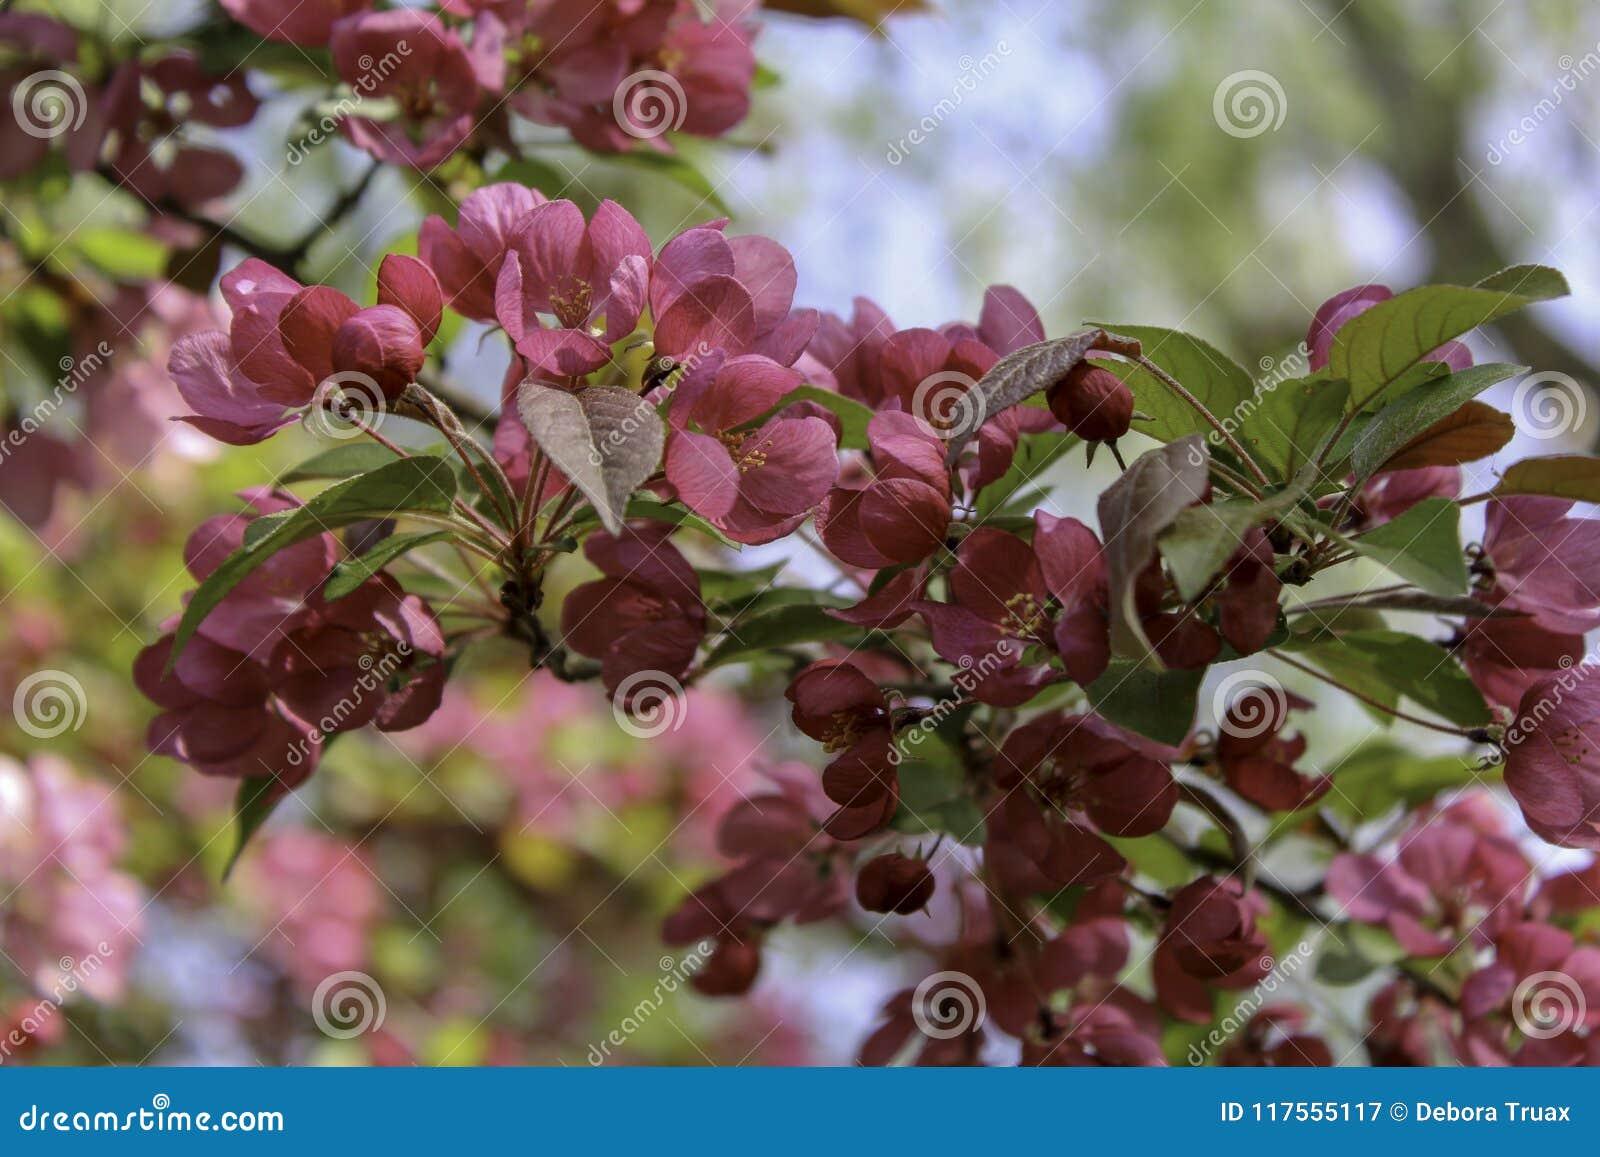 Dark pink crabapple blooming in the spring stock image image of dark pink crabapple blooming in the spring mightylinksfo